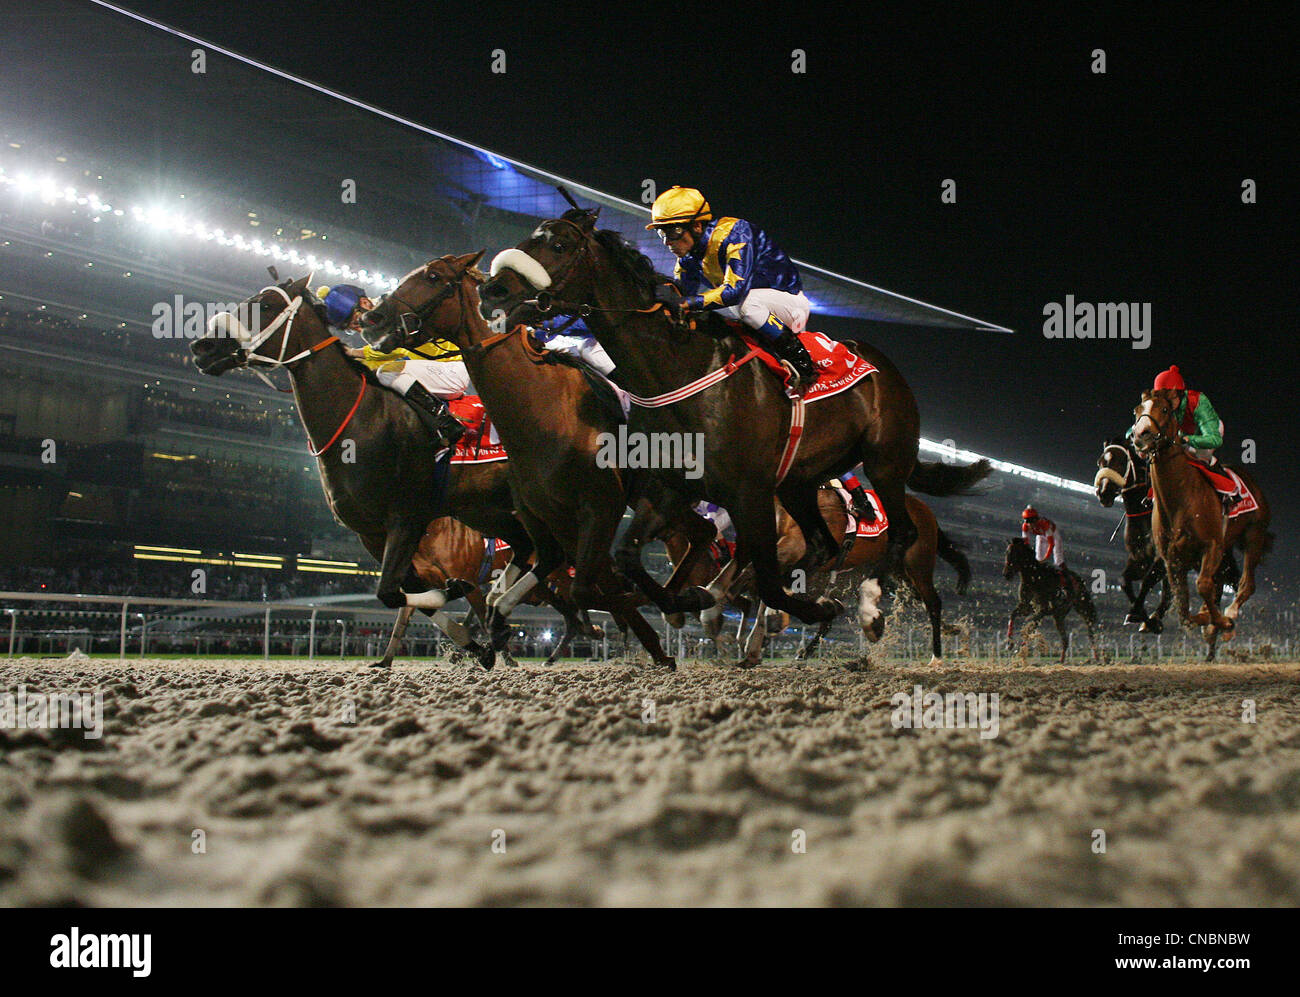 Horses and jockeys on the Meydan horse race track, Dubai, UAE - Stock Image